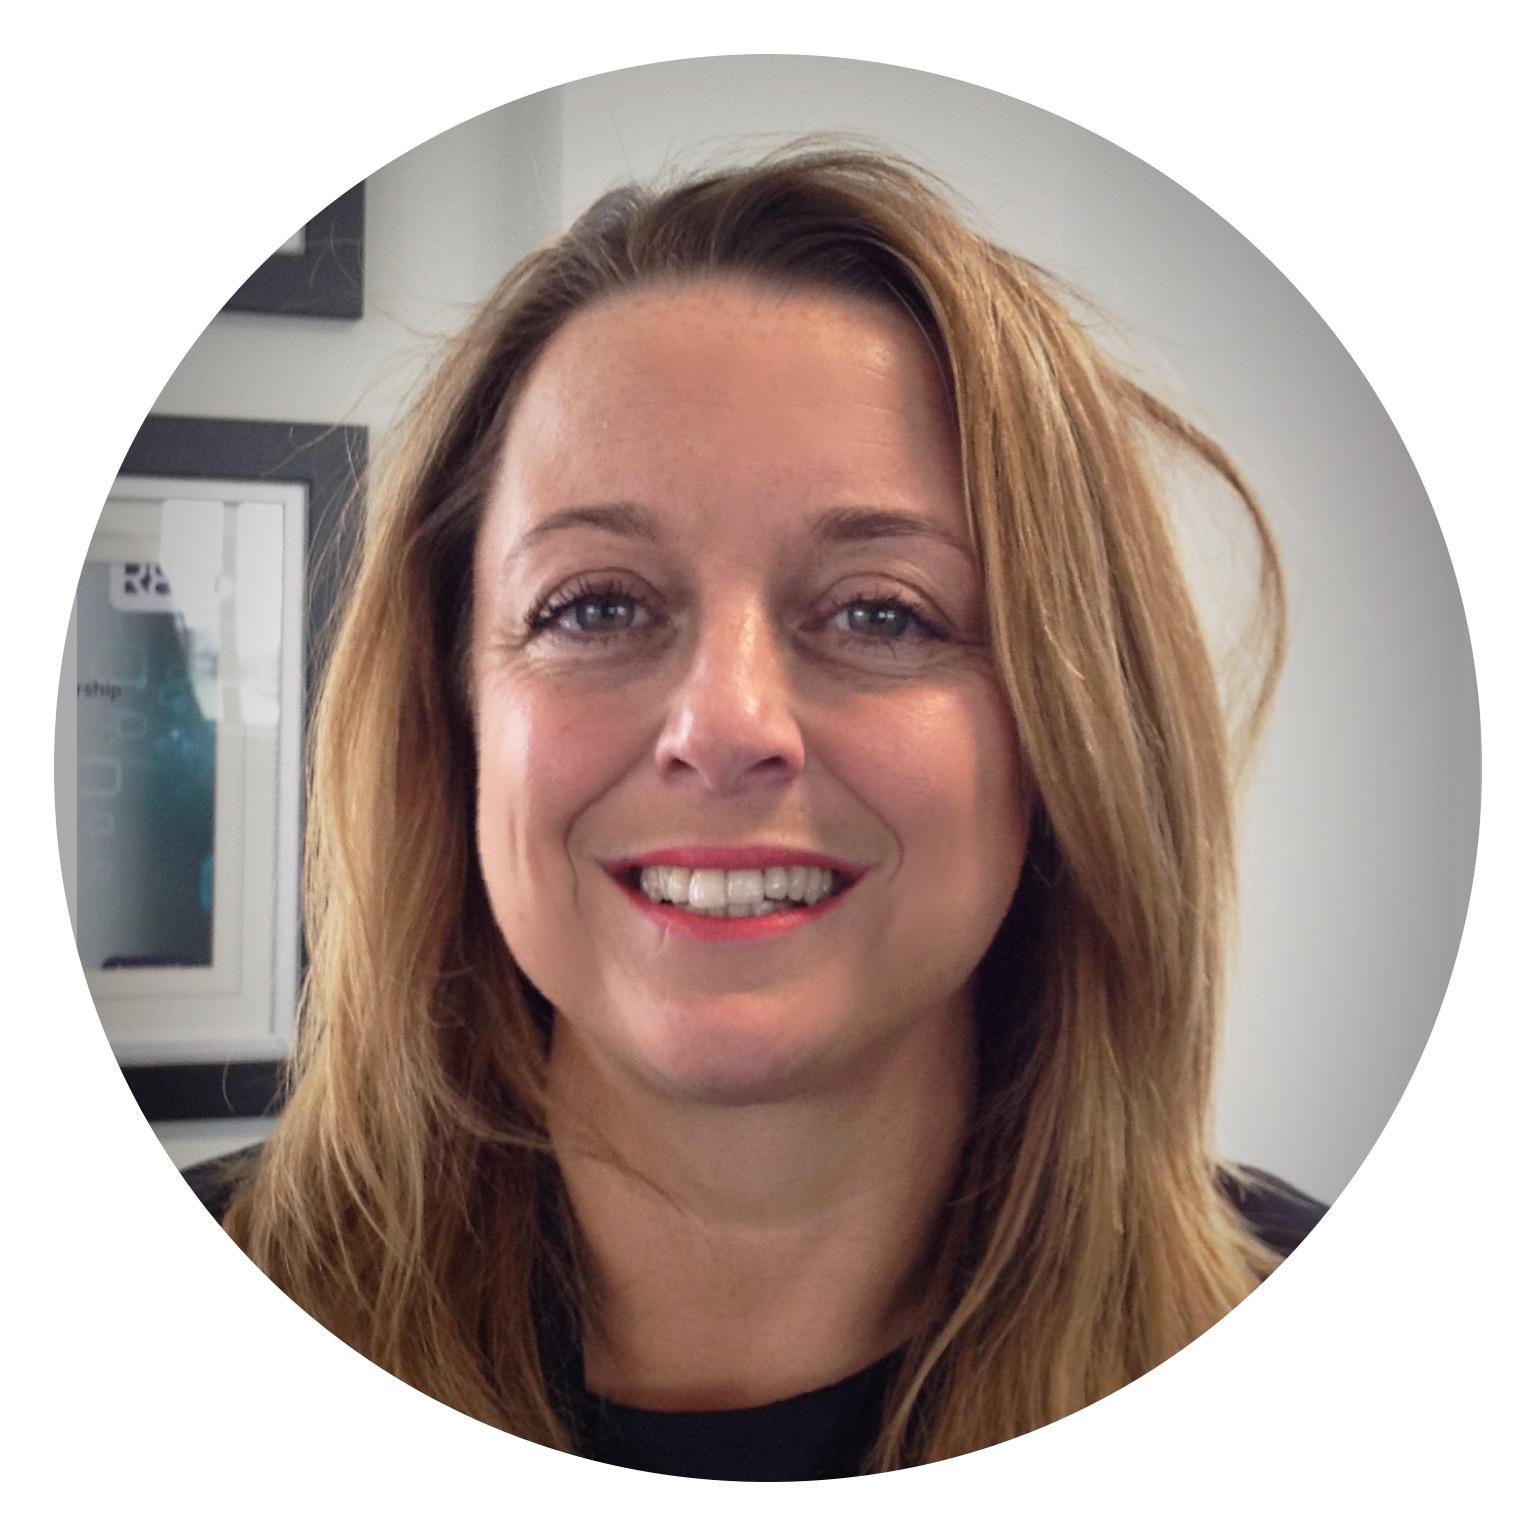 Rae McGlone - OPSA Trustee